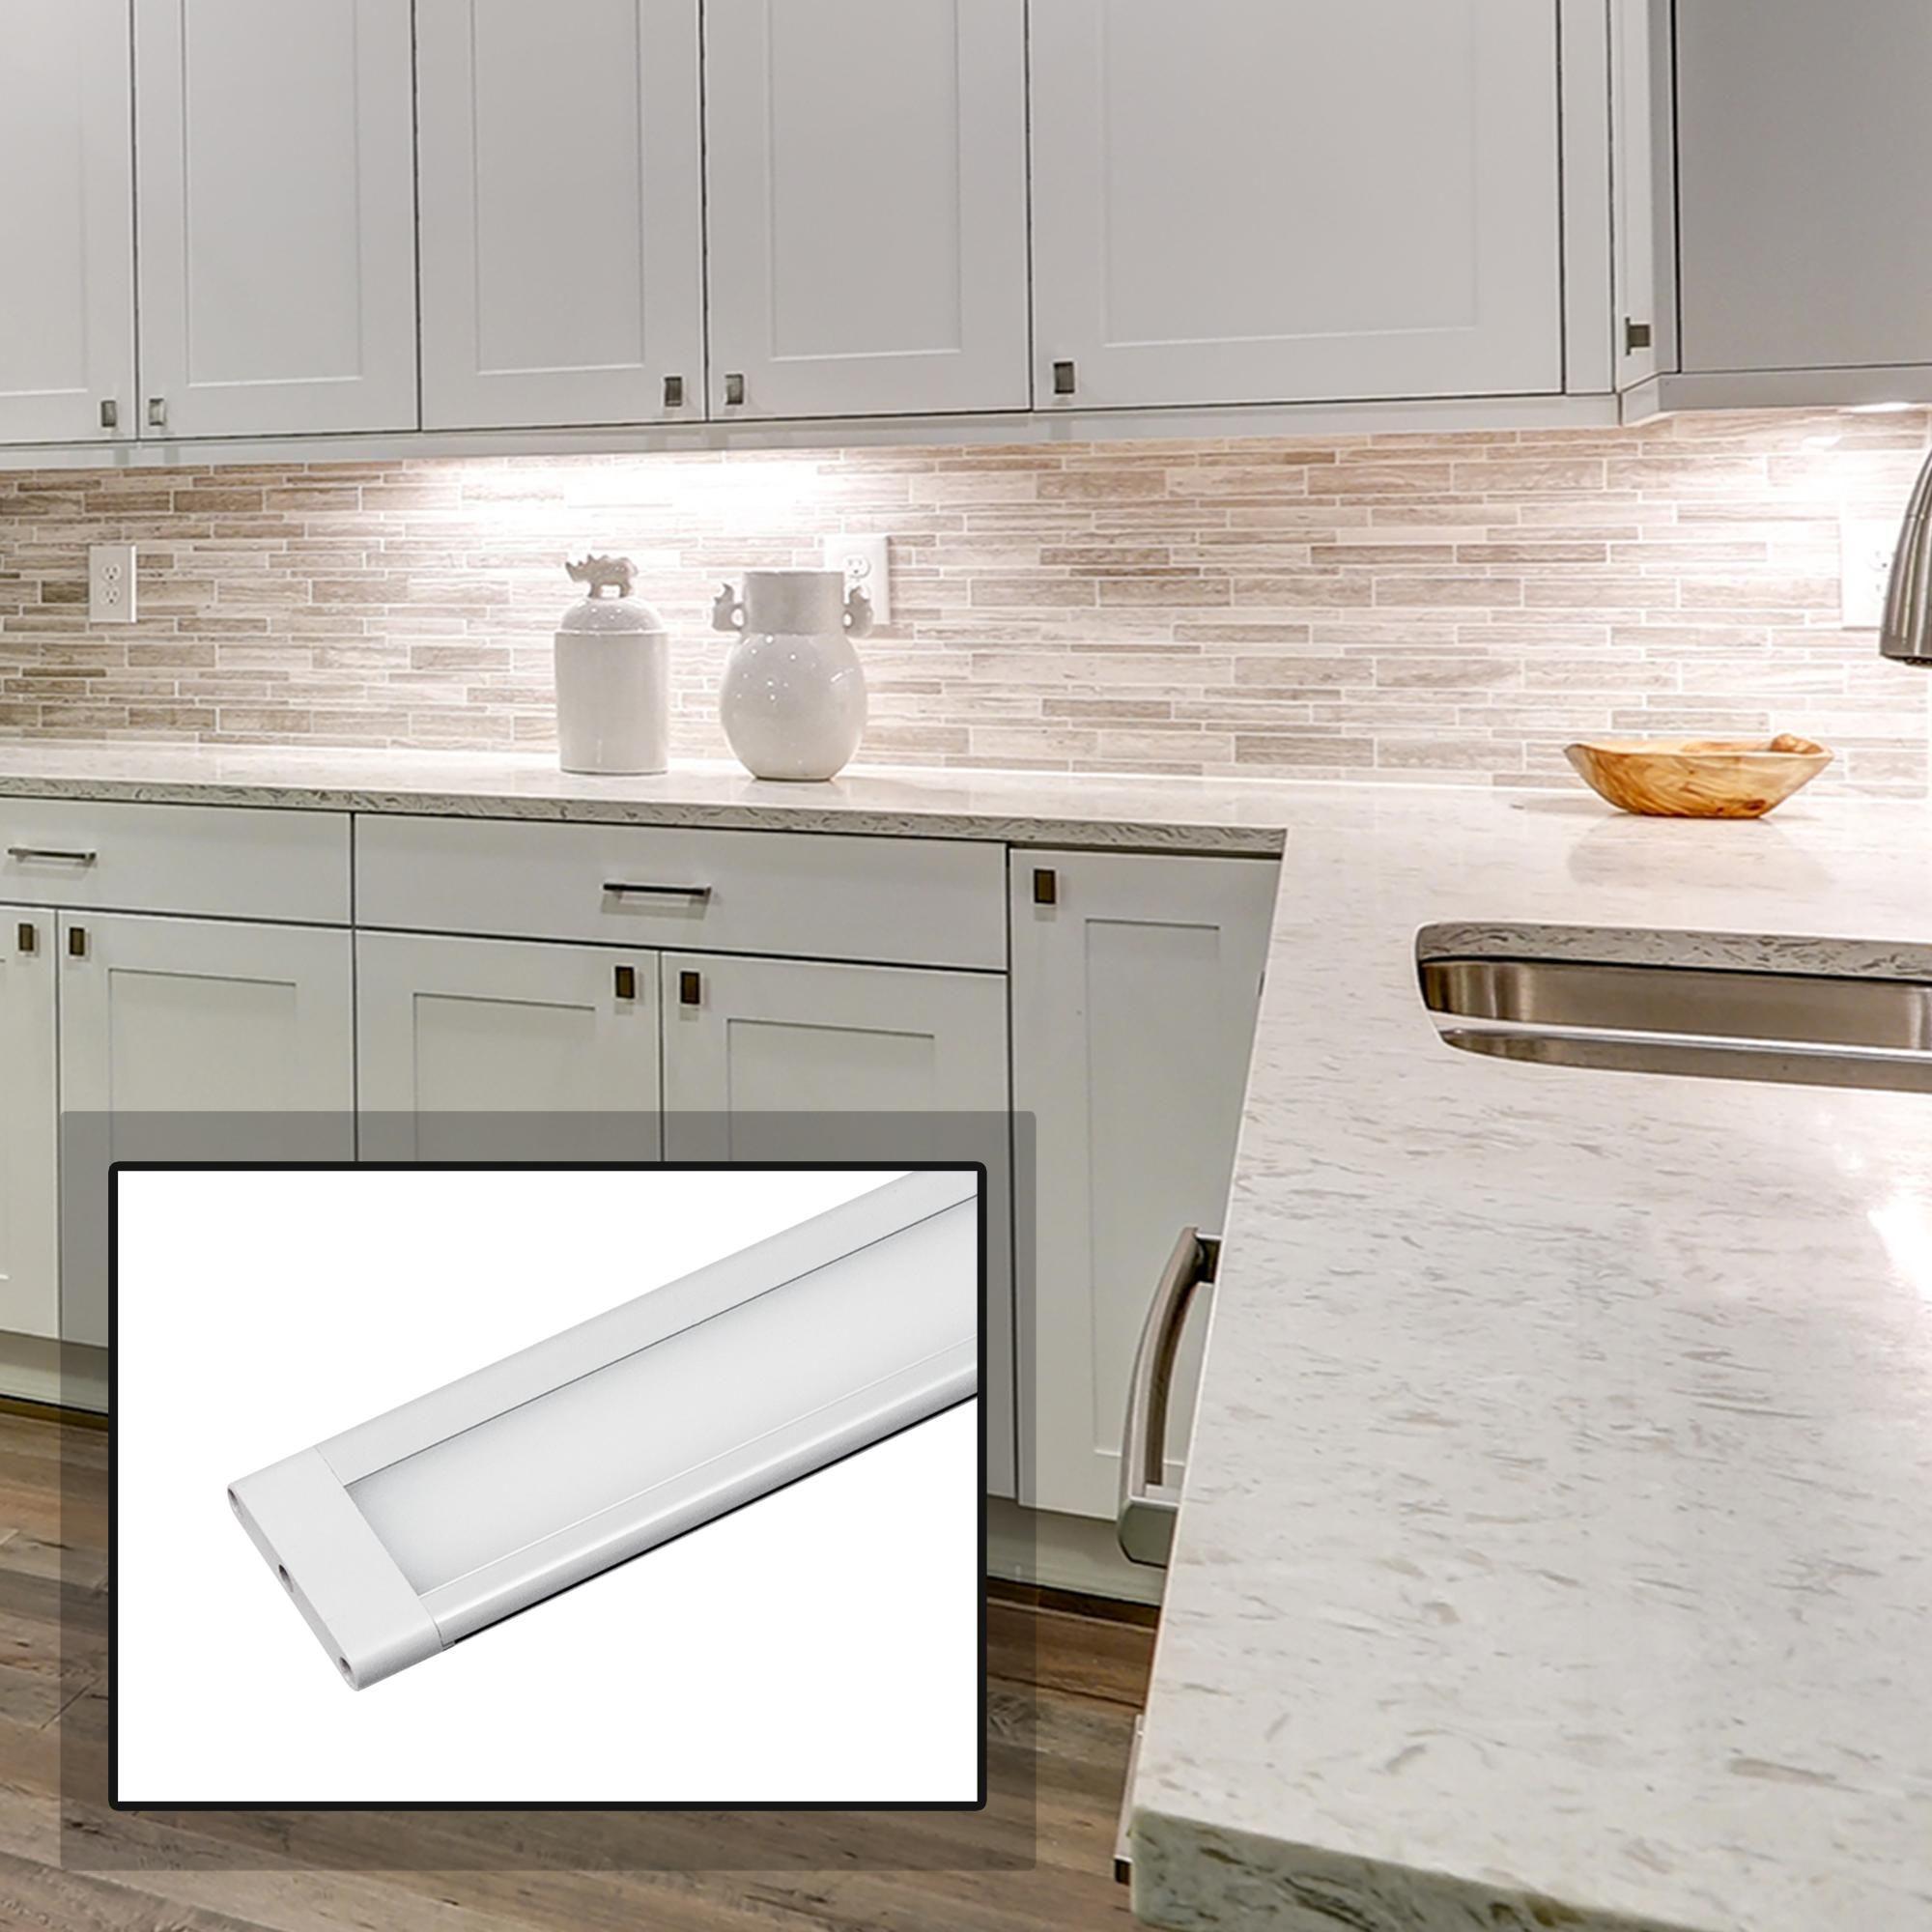 Slimedge 8 Inch W White 3000k Led Under Cabinet Lt With Images Light Kitchen Cabinets